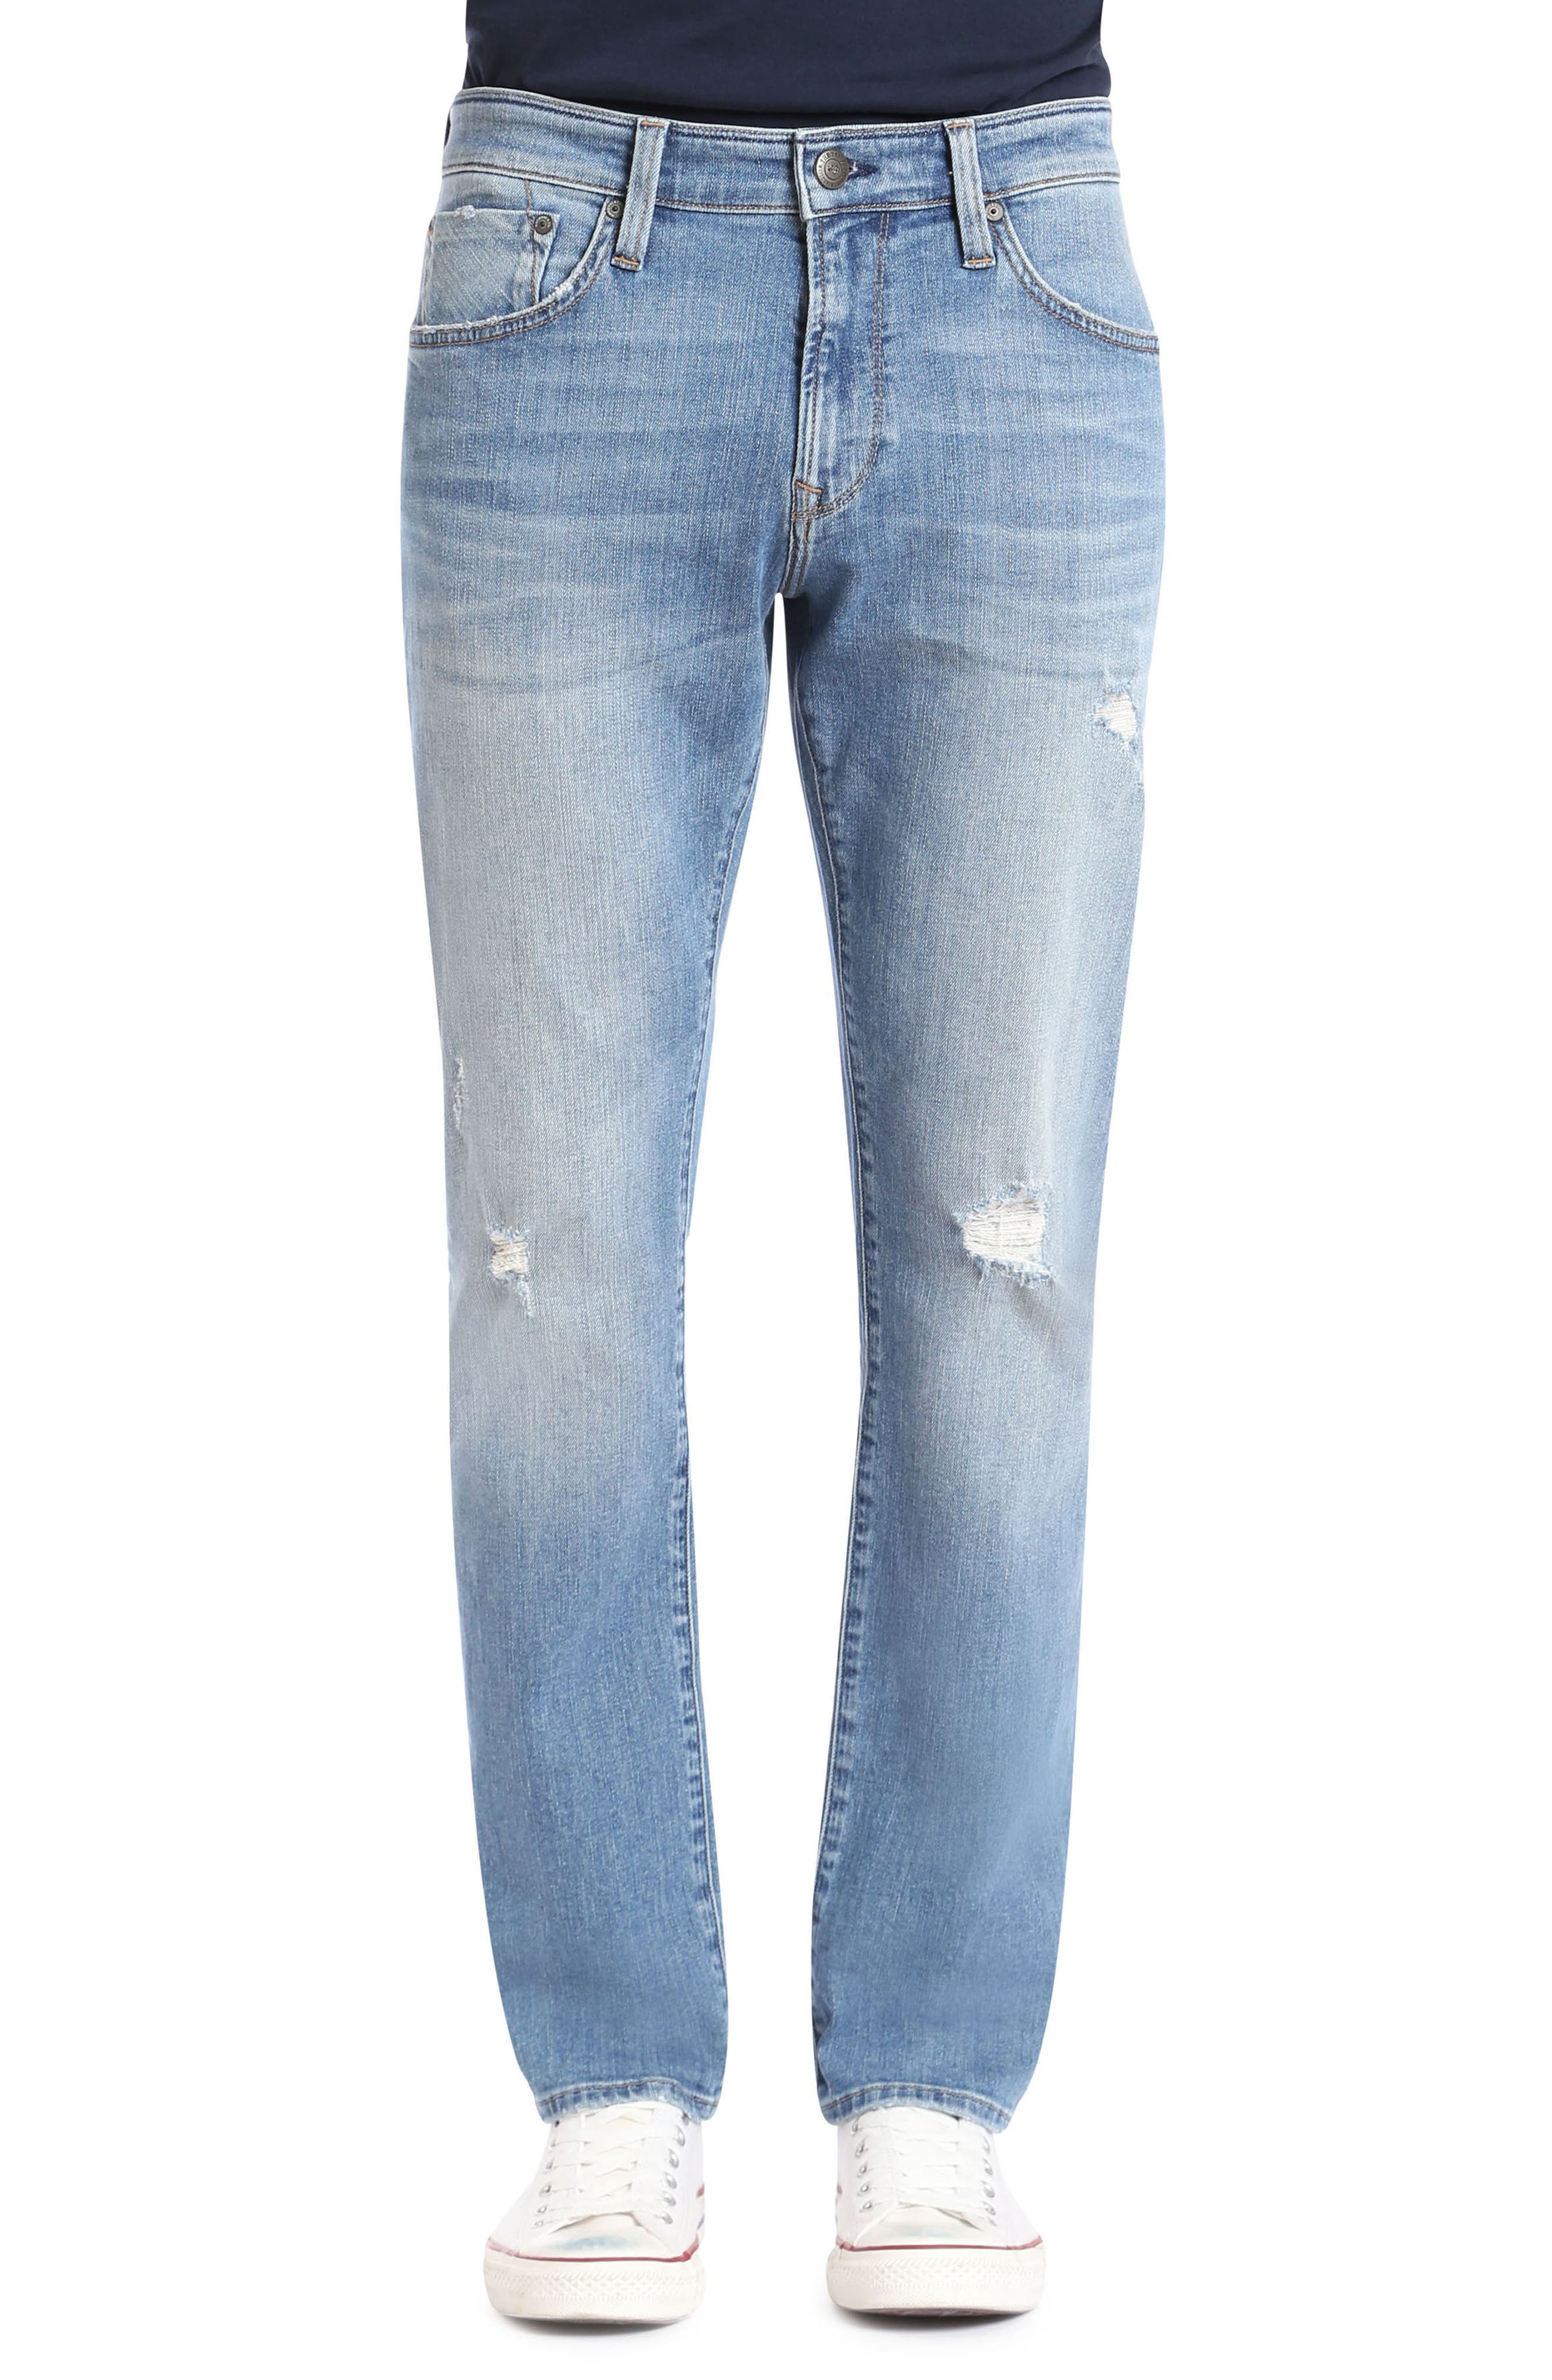 Jake Slim Fit Jeans,                         Main,                         color, Lt Used Authentic Vintage